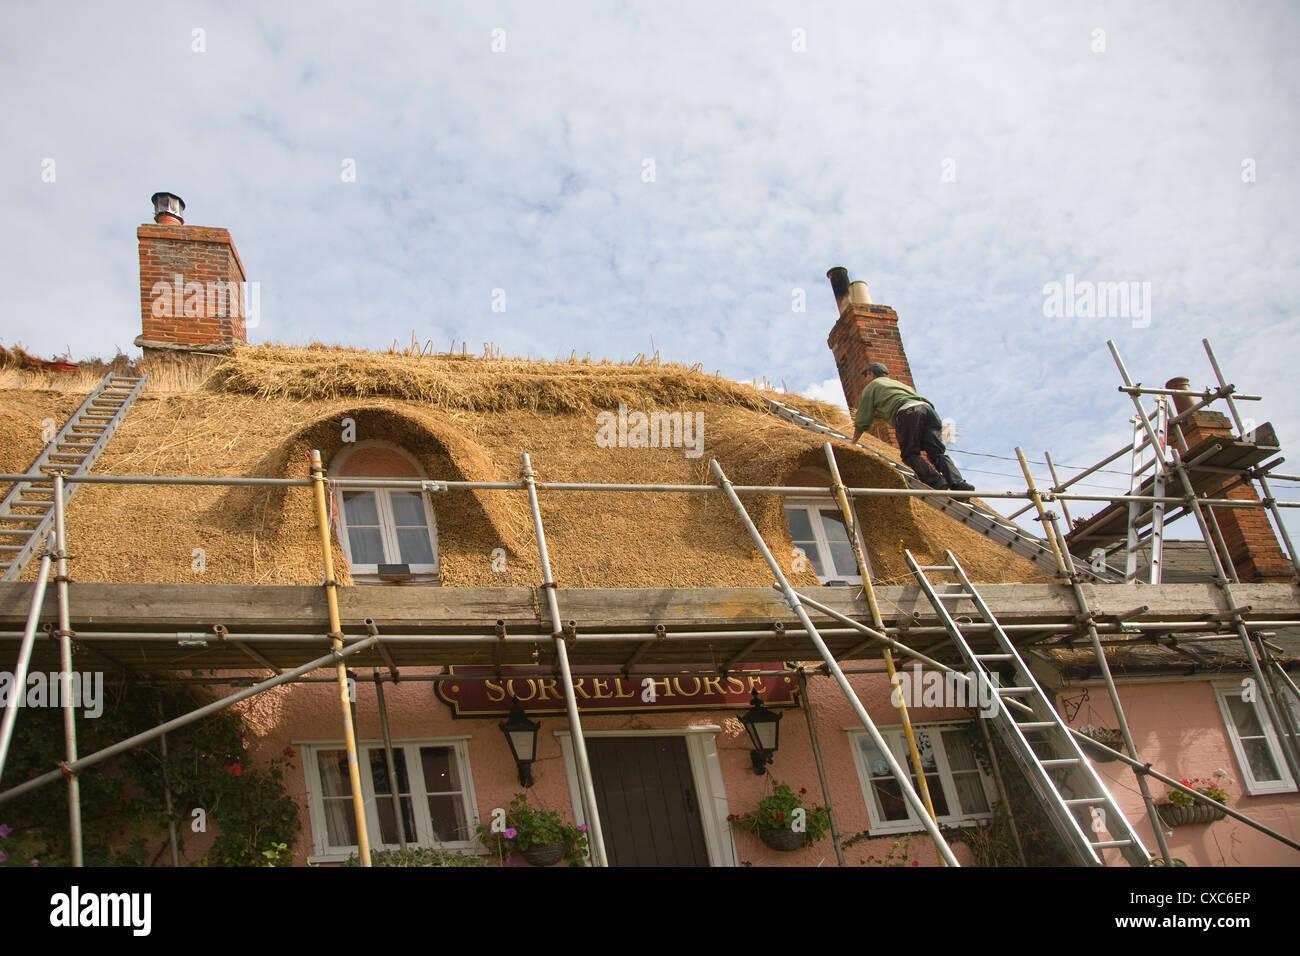 Thatcher thatching country Sorrel Horse pub roof Shottisham Suffolk England - Stock Image